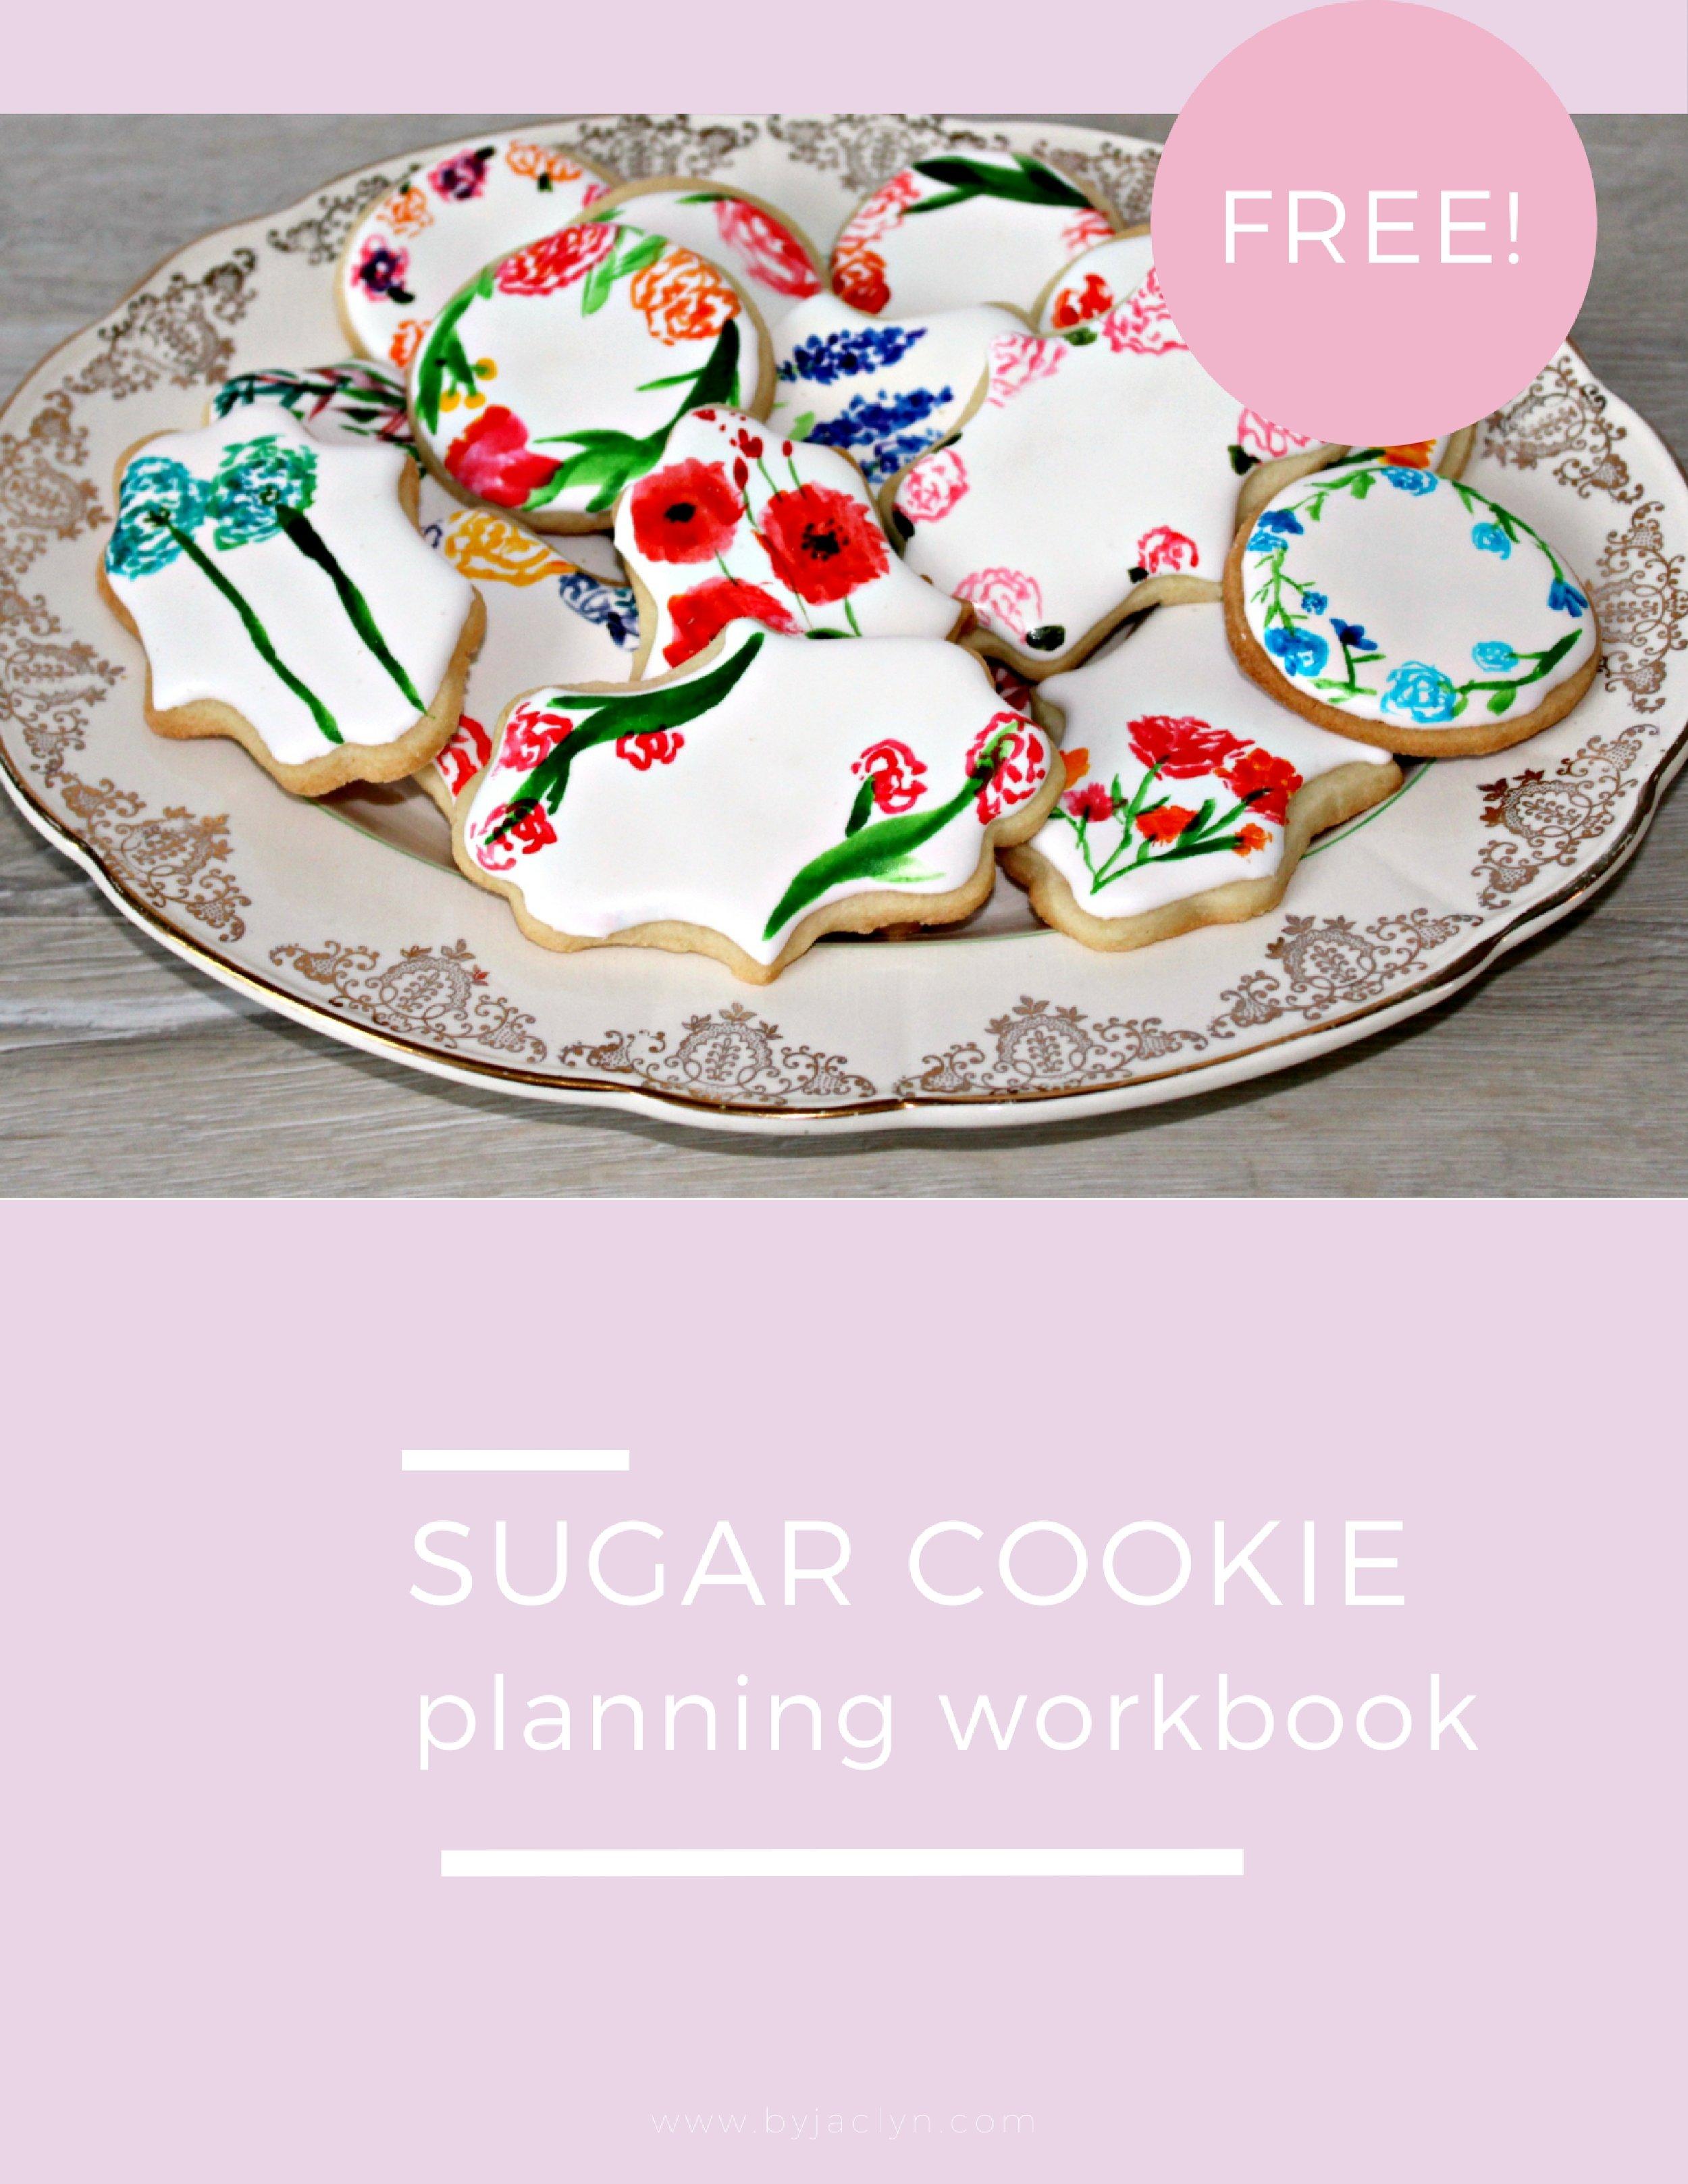 Free Sugar Cookie Planning Workbook